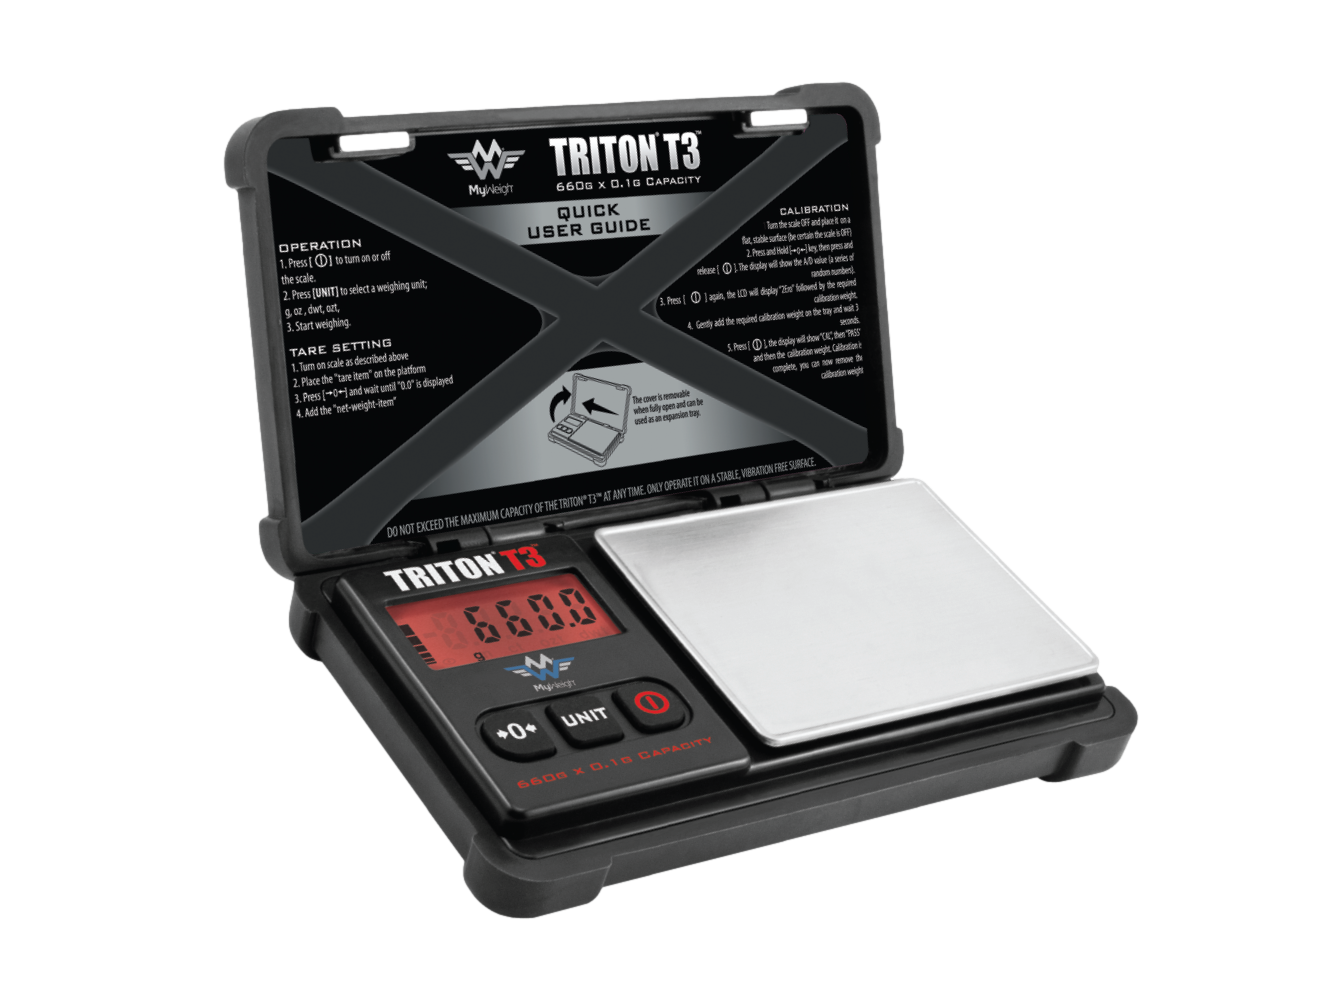 Triton T3 660g x 0.1g